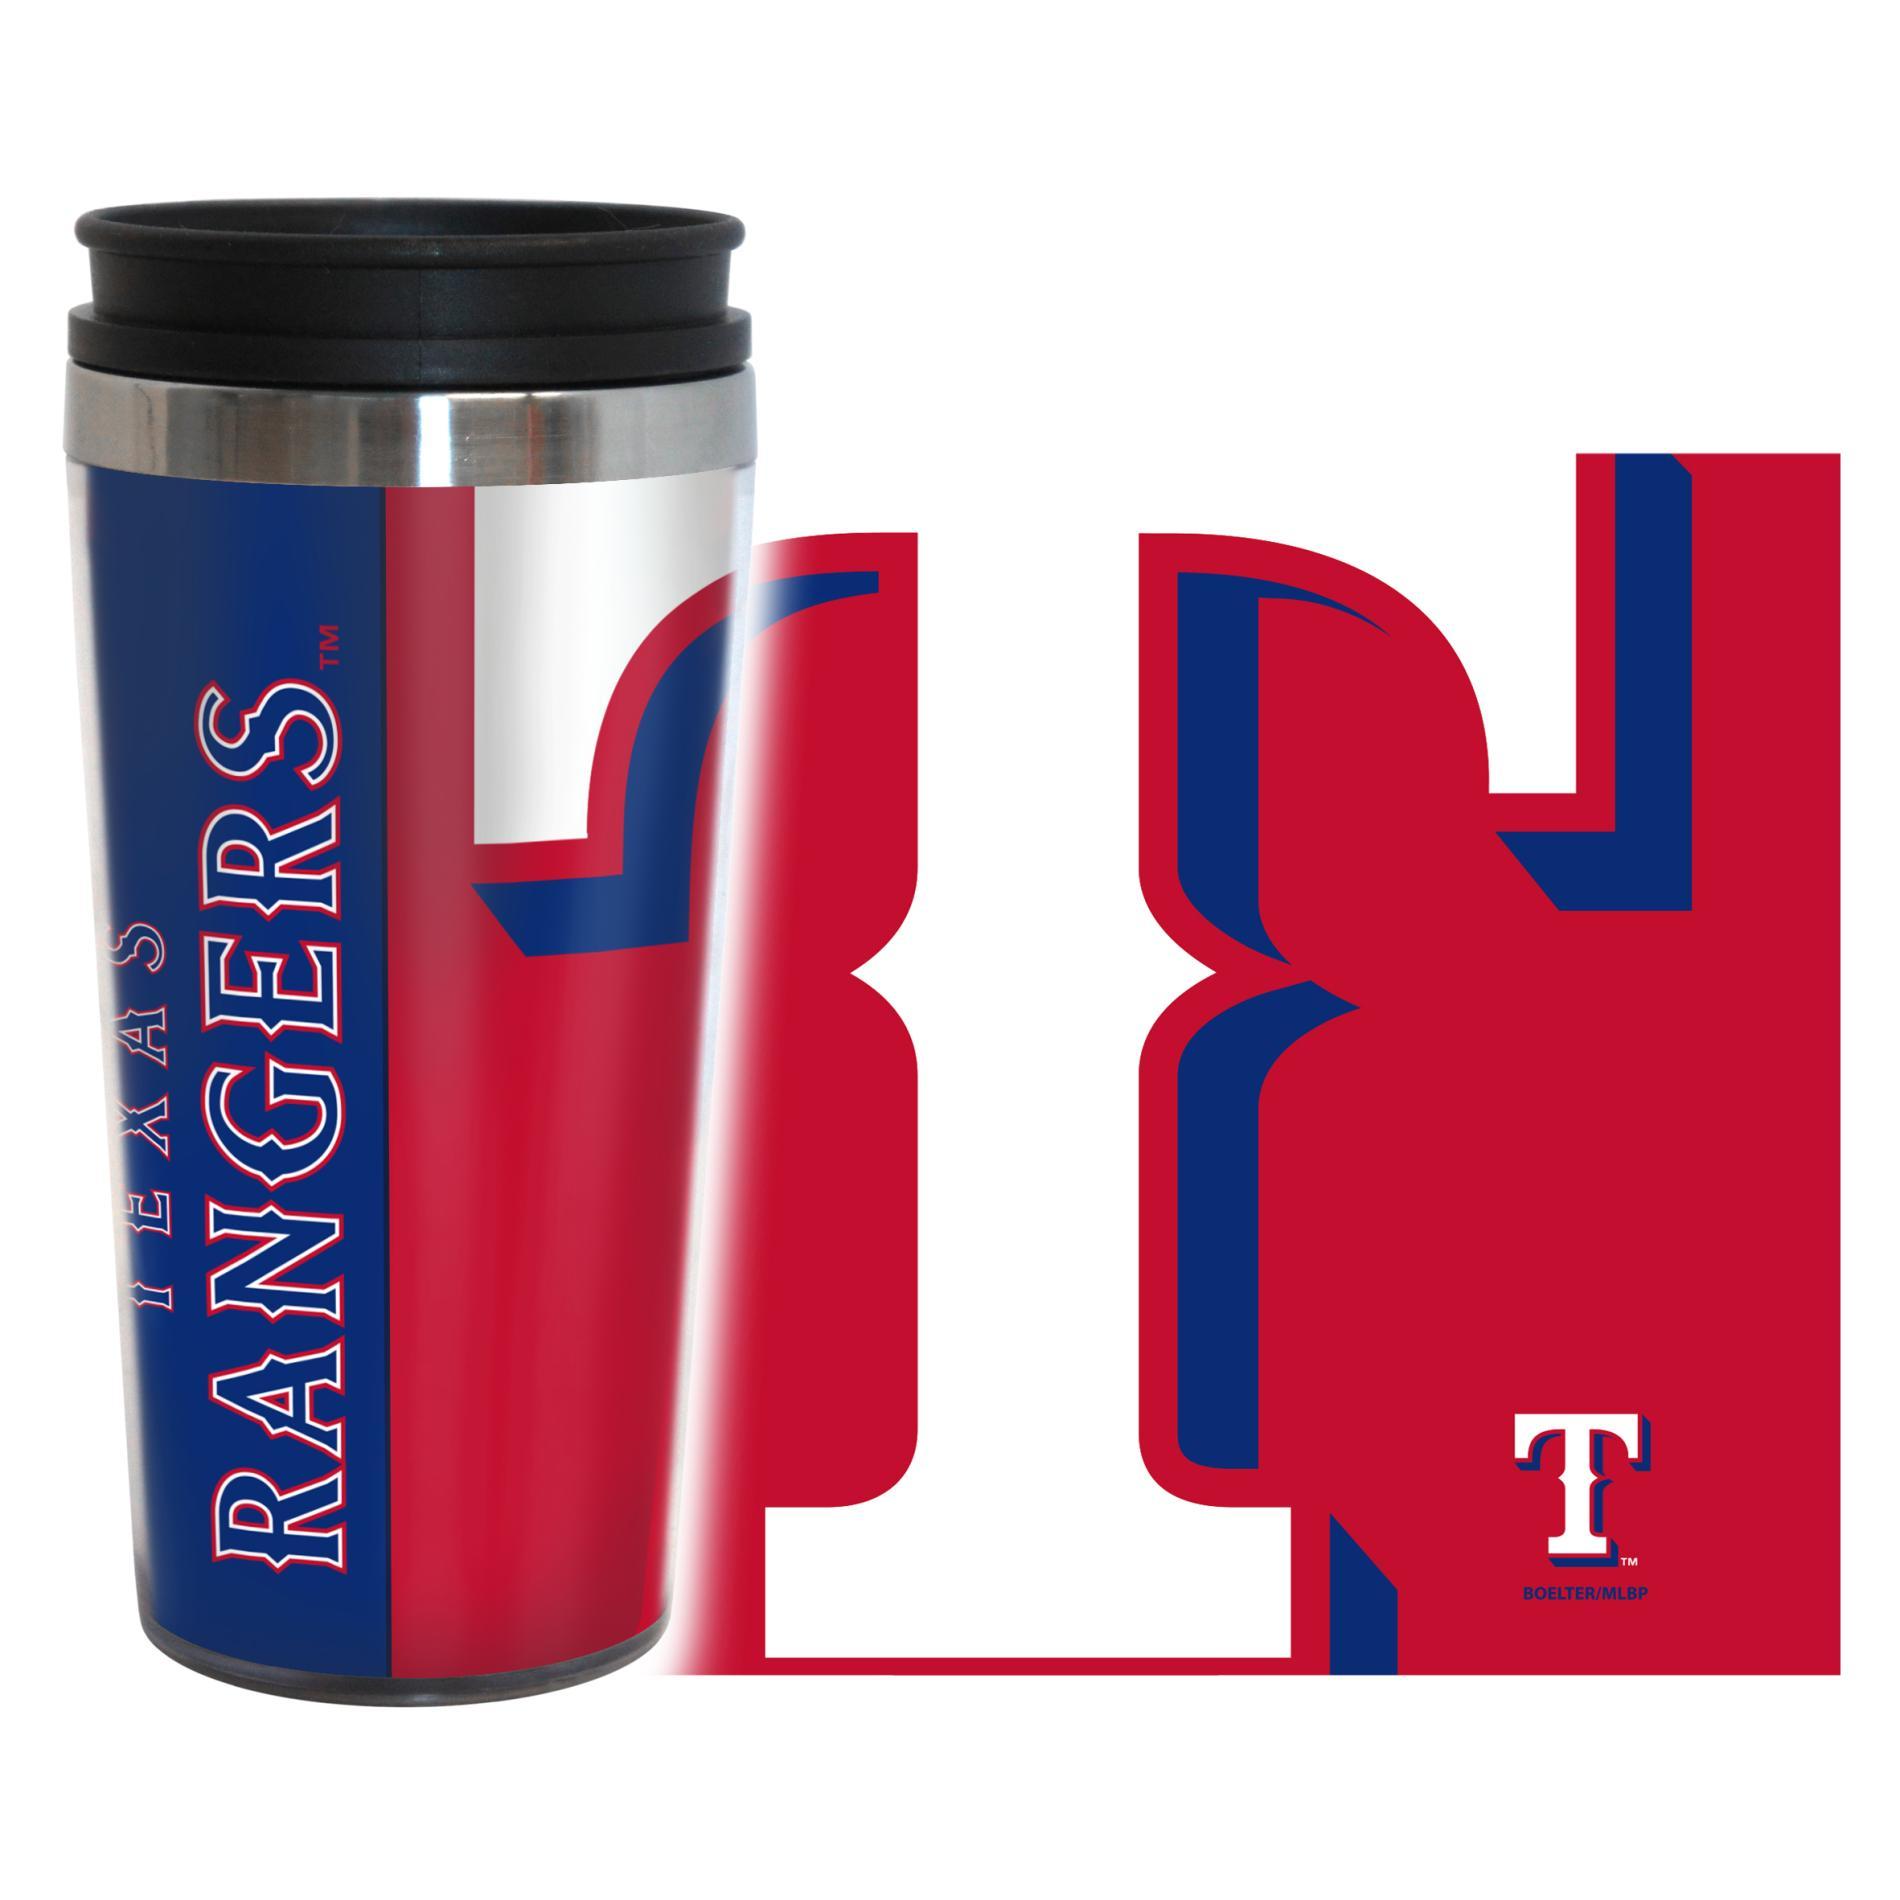 MLB Hype Travel Mug - Texas Rangers PartNumber: 046W002647790001P KsnValue: 2647790 MfgPartNumber: 428160